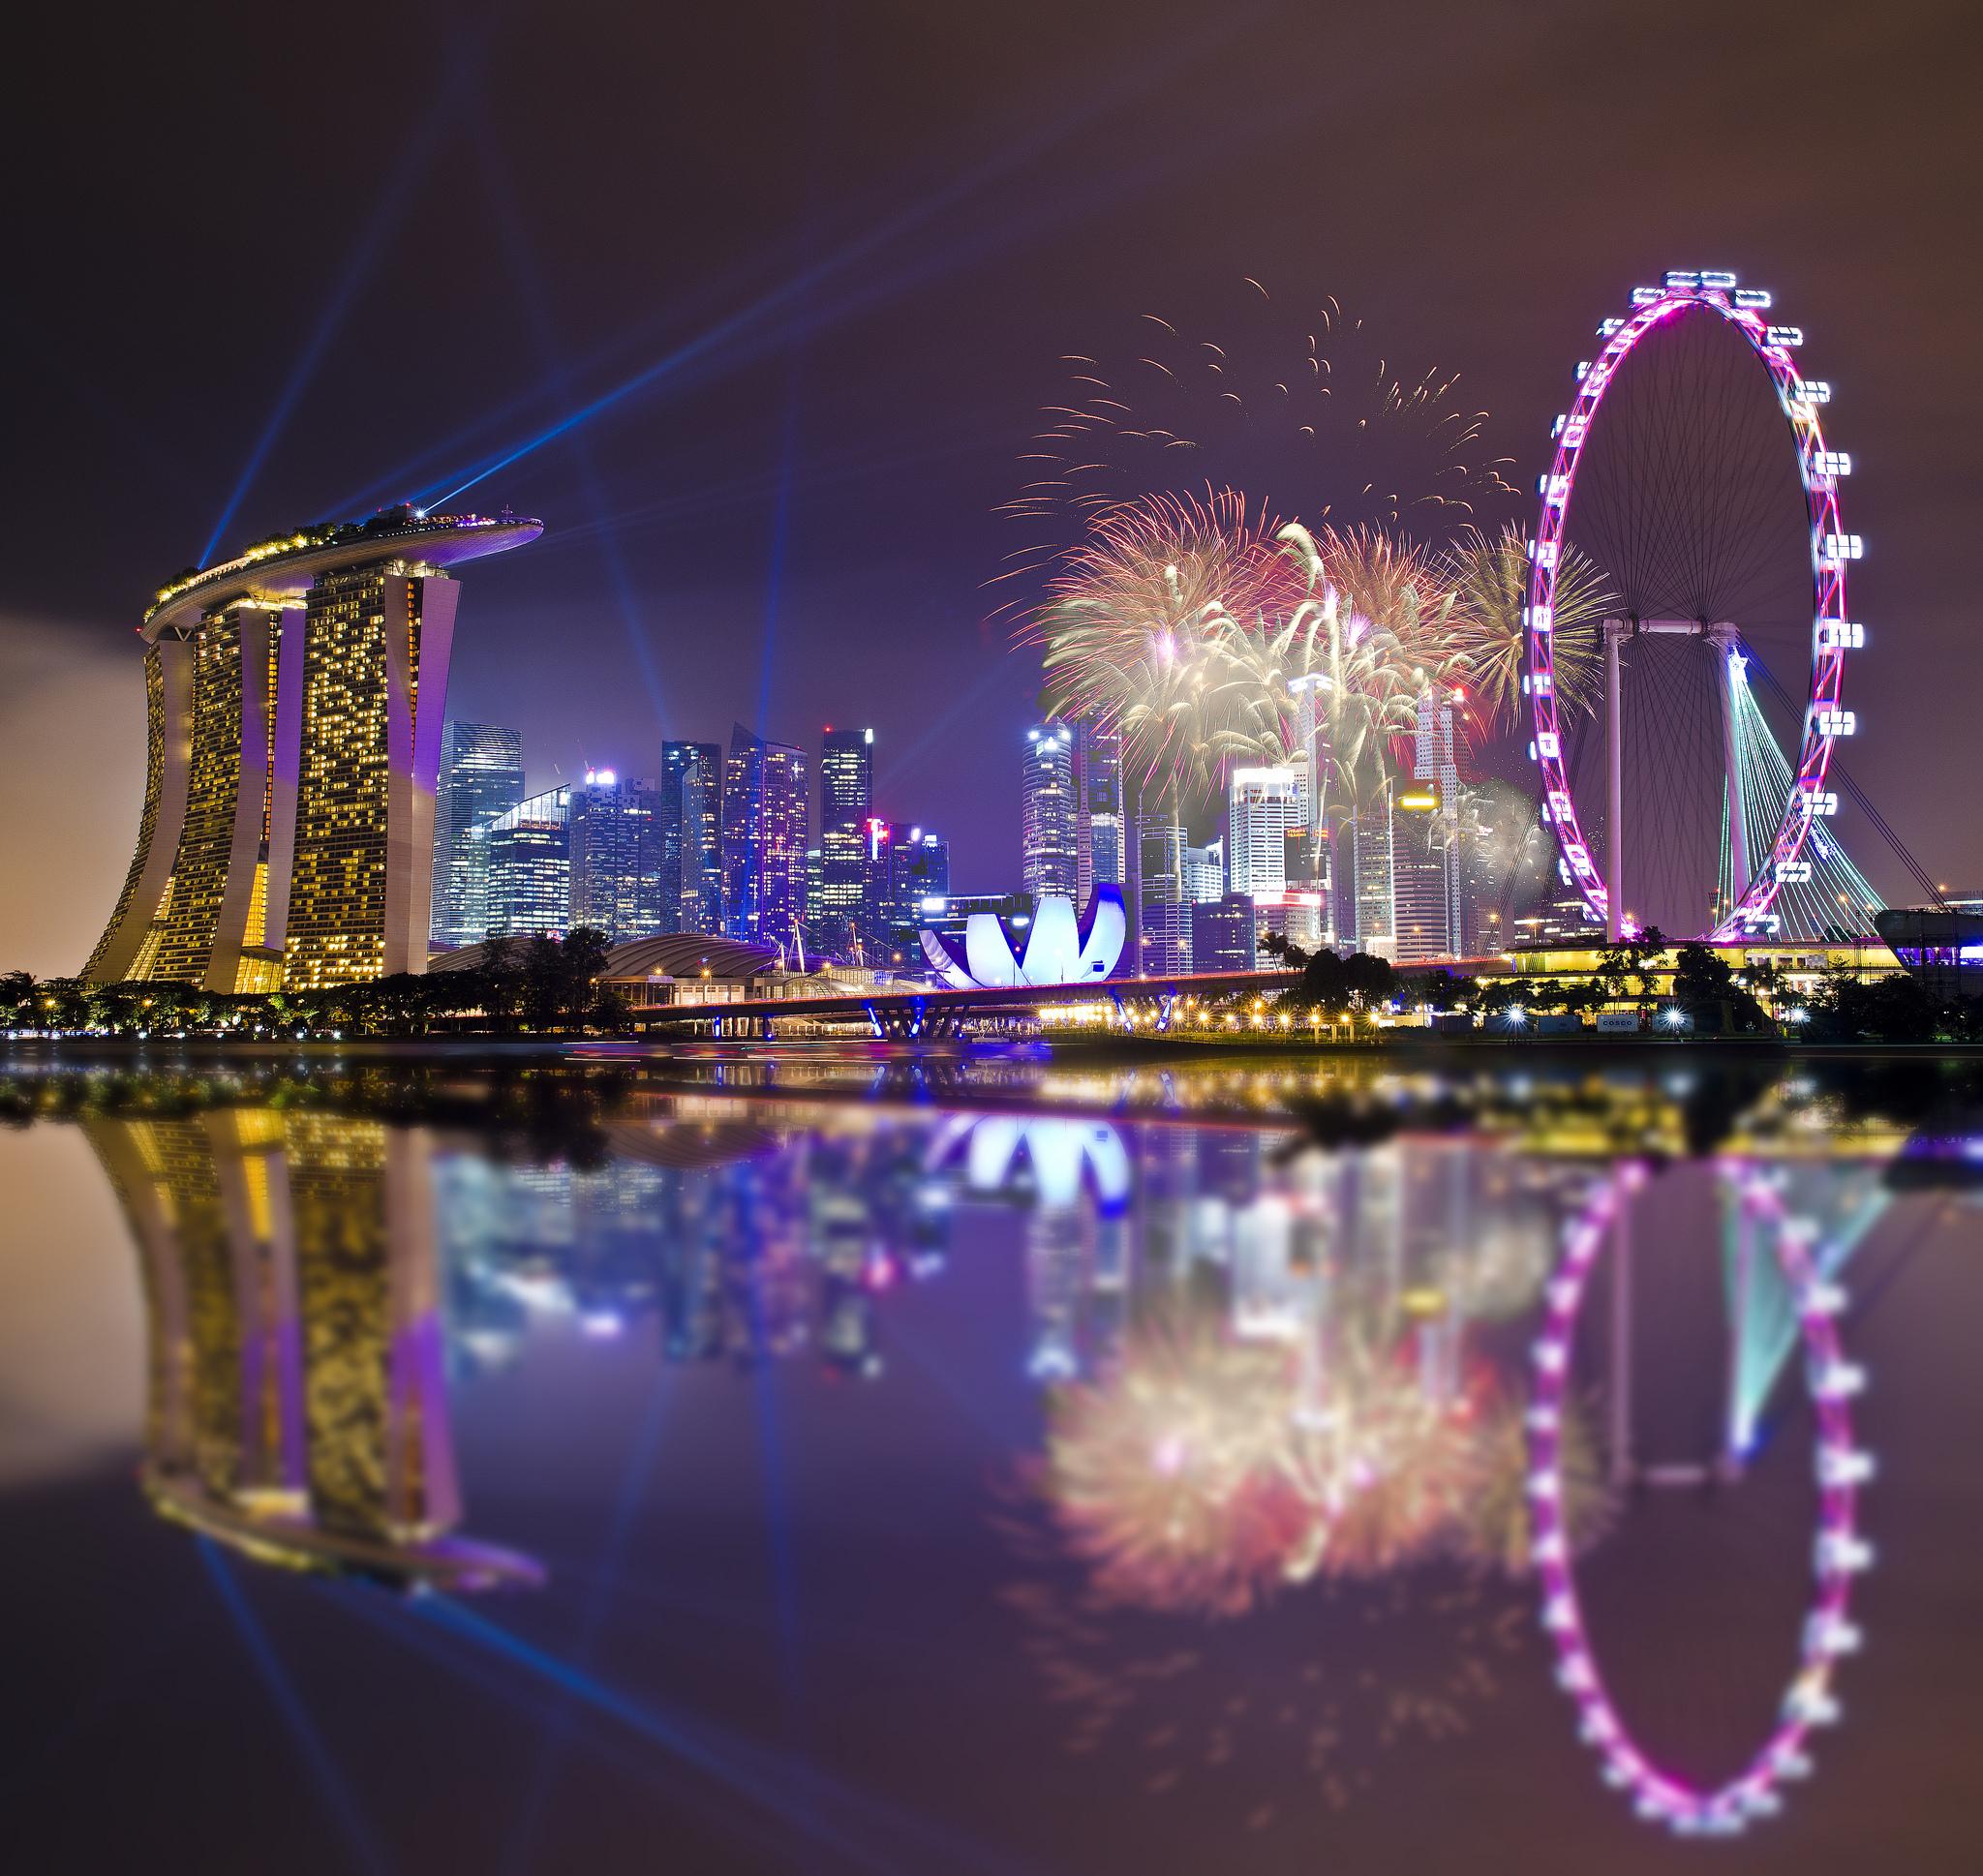 страны архитектура Сингапур ночь  № 1475994 бесплатно